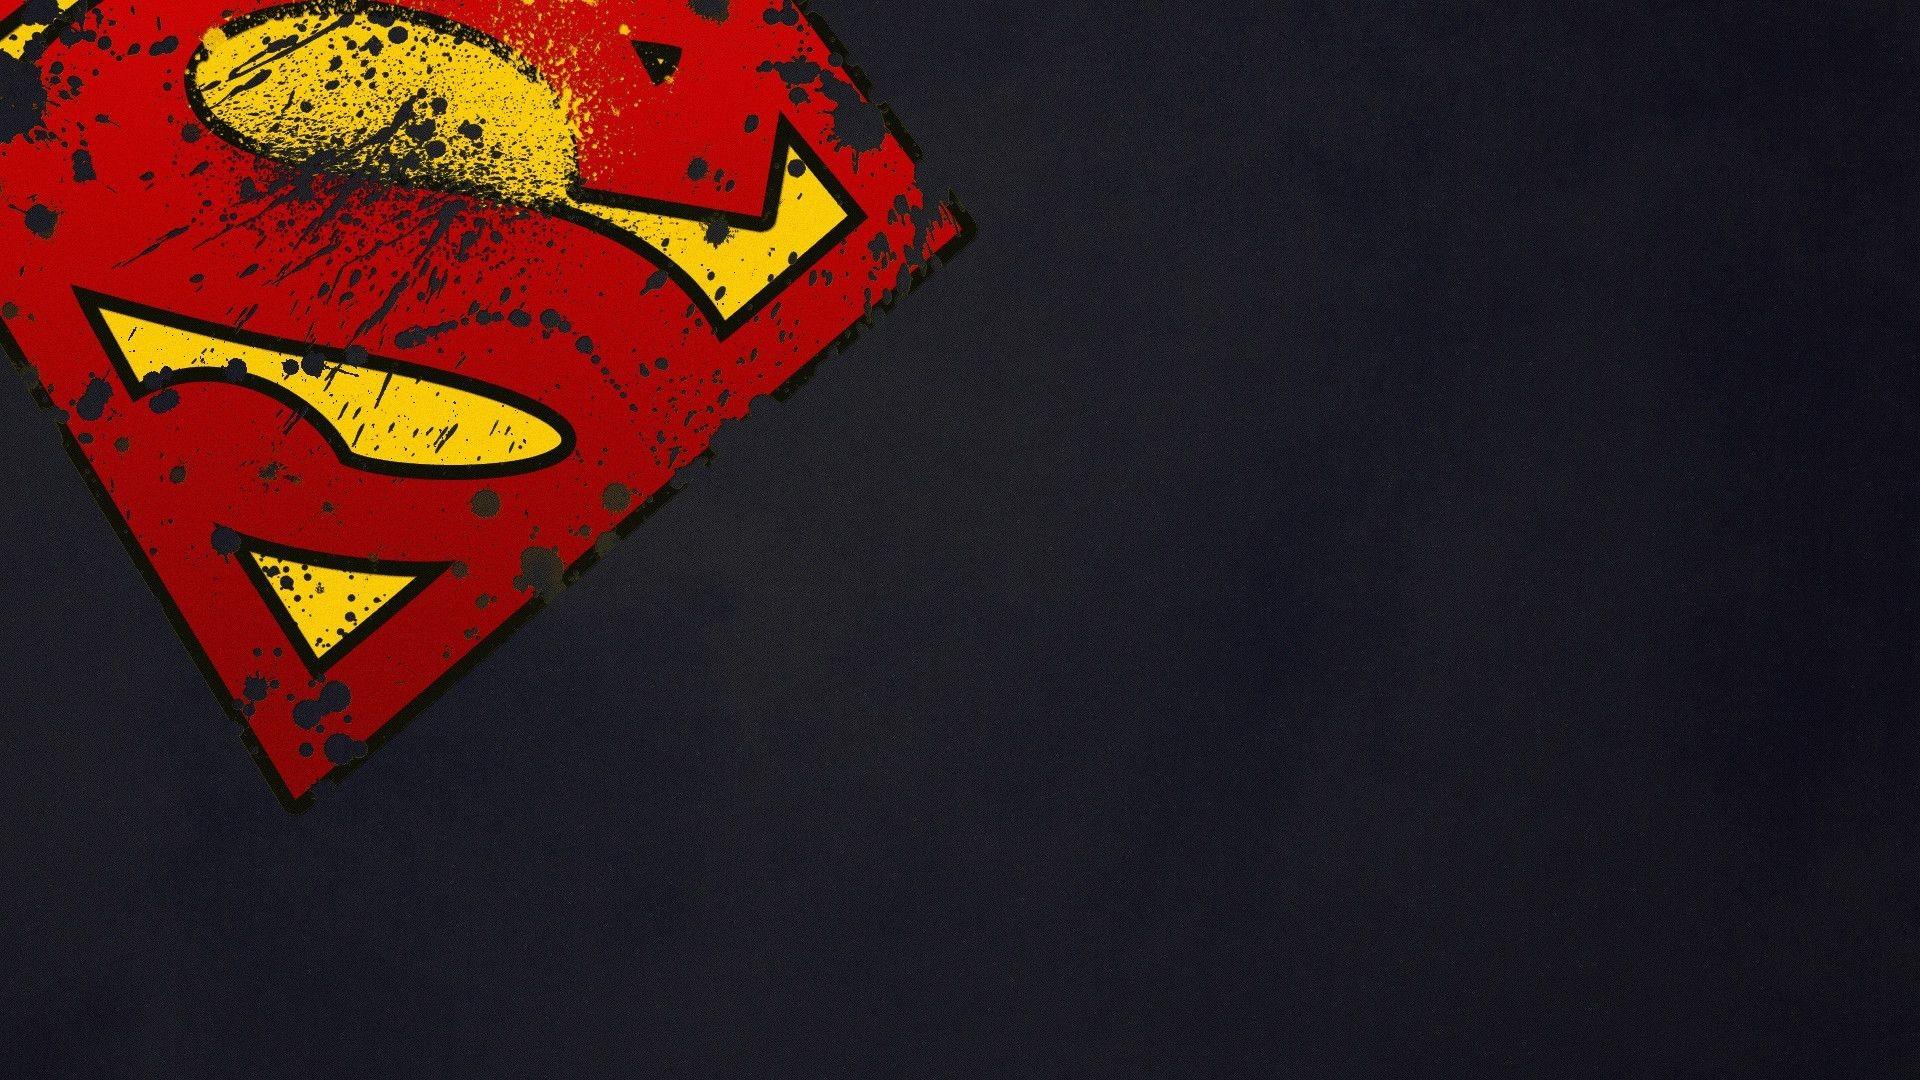 4k Superhero Wallpapers 52 Images